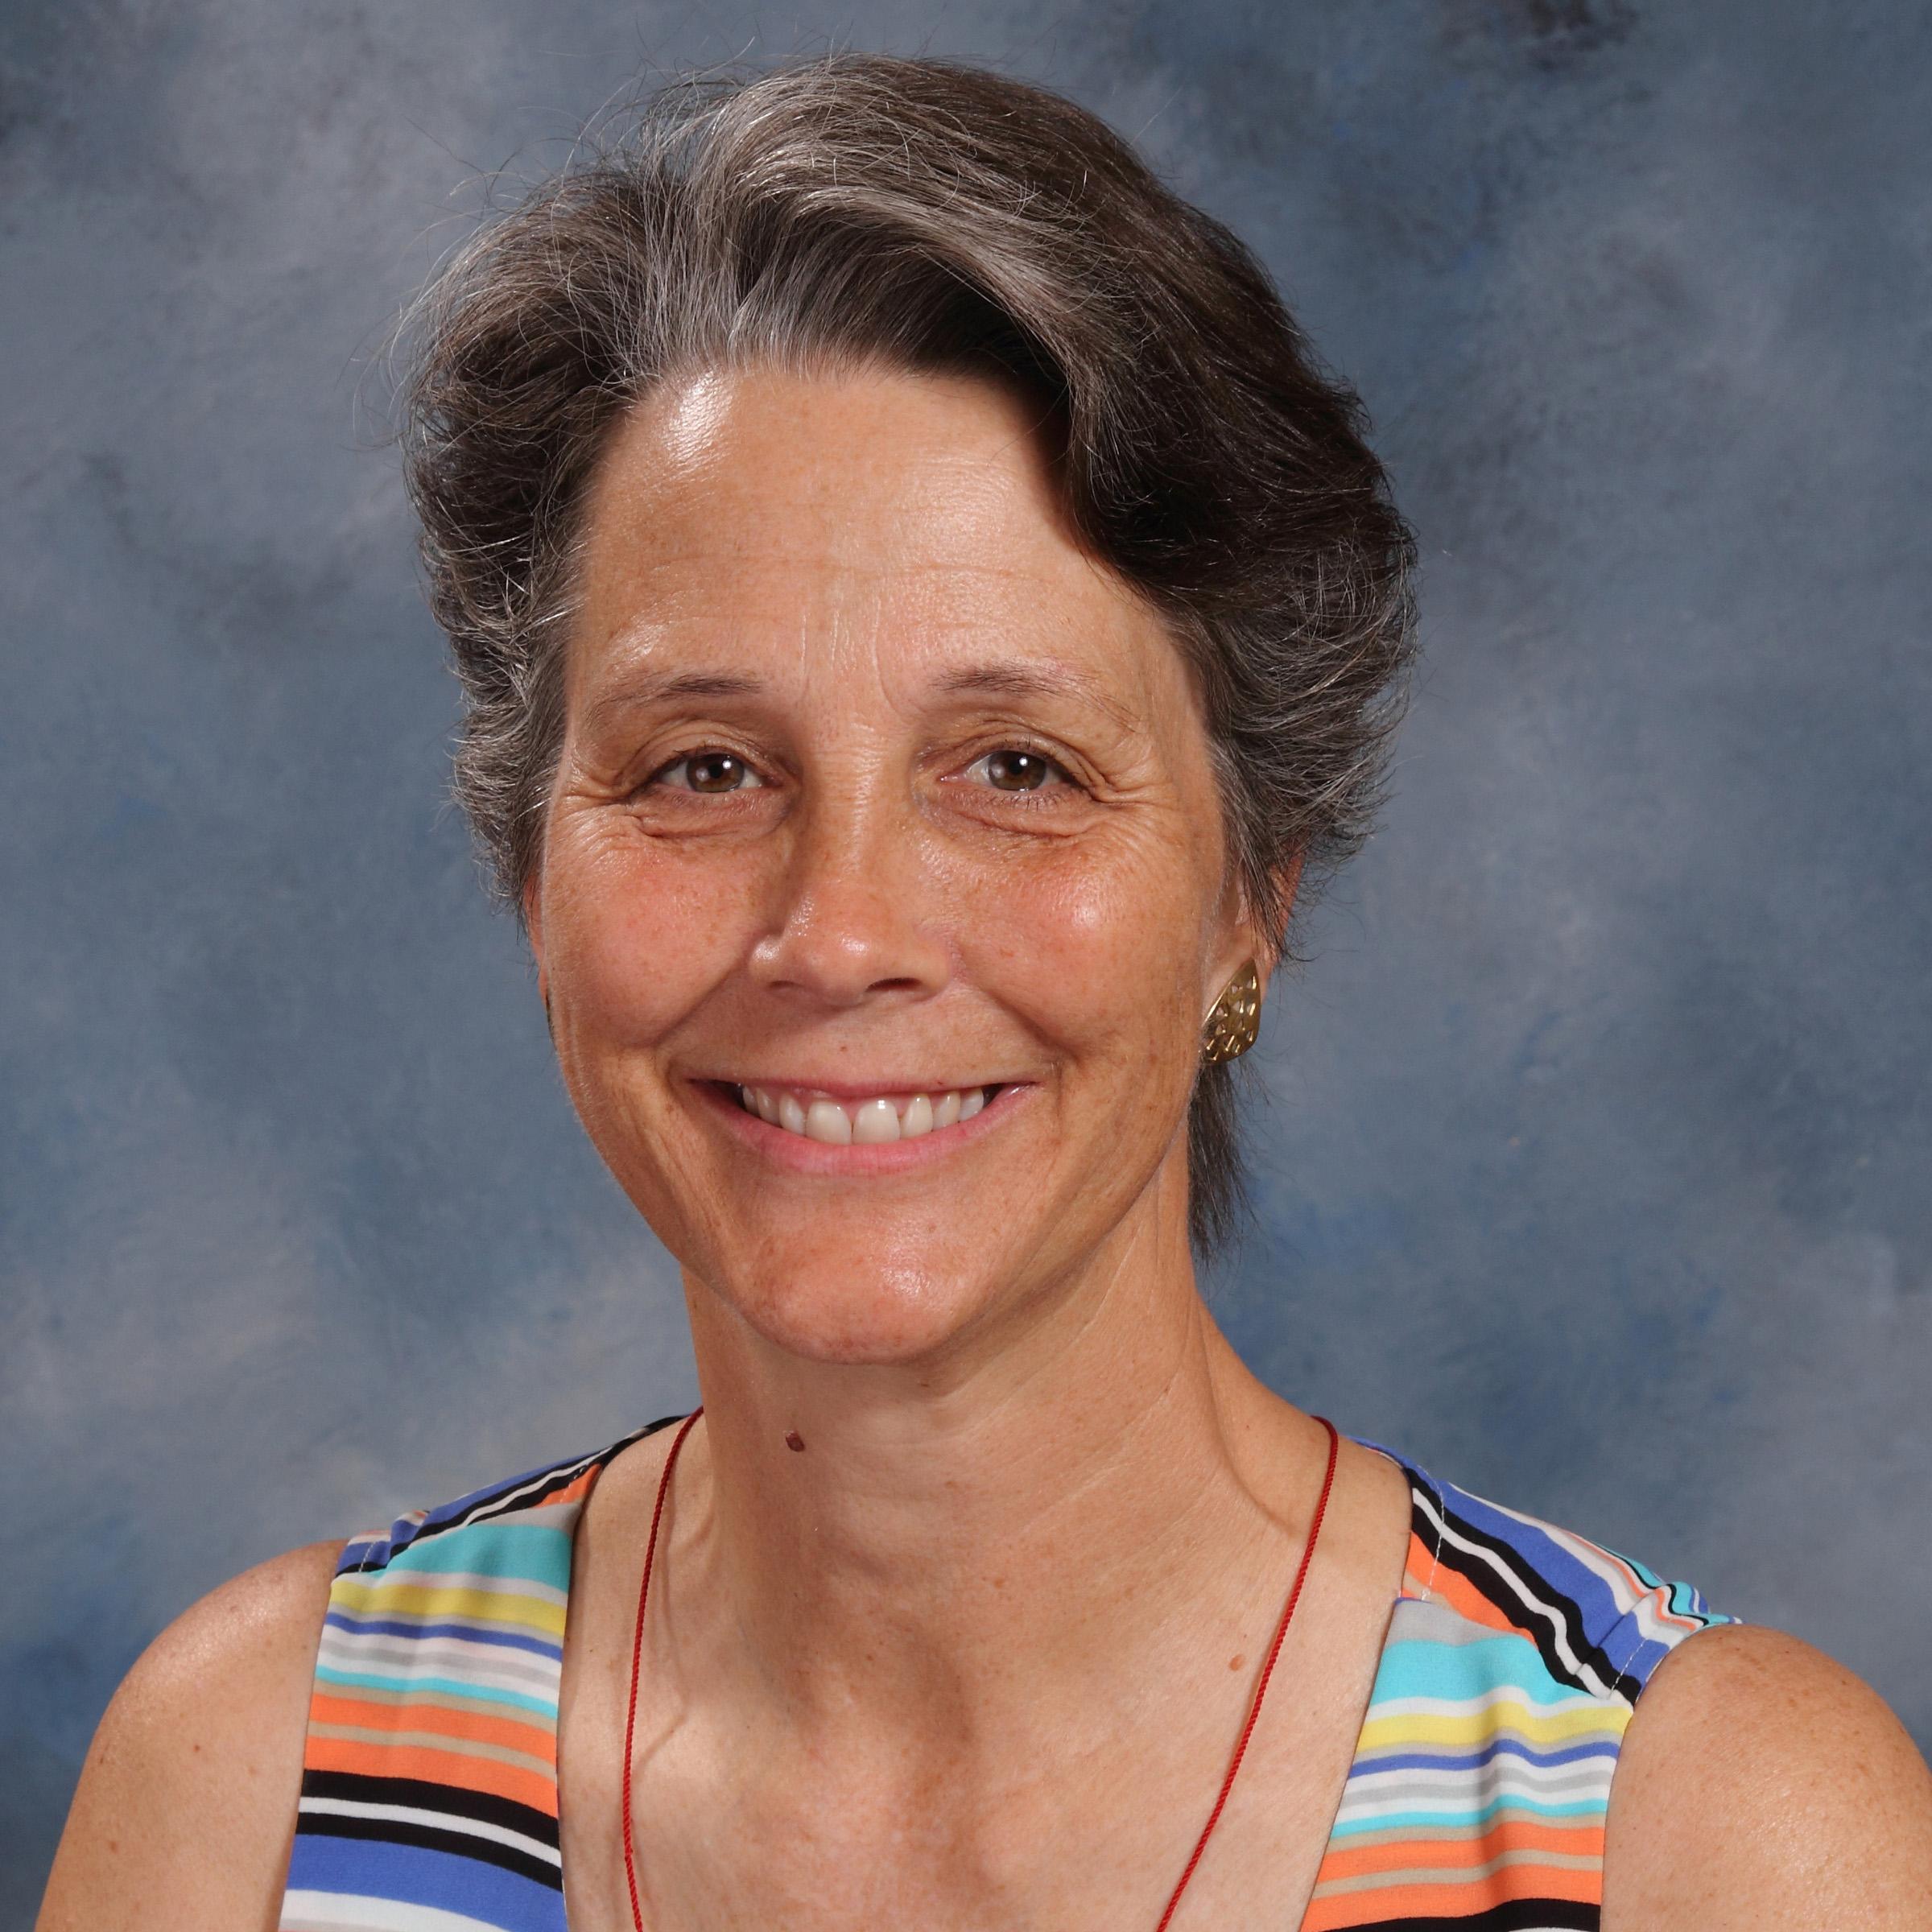 Trish Spoerl, Principal